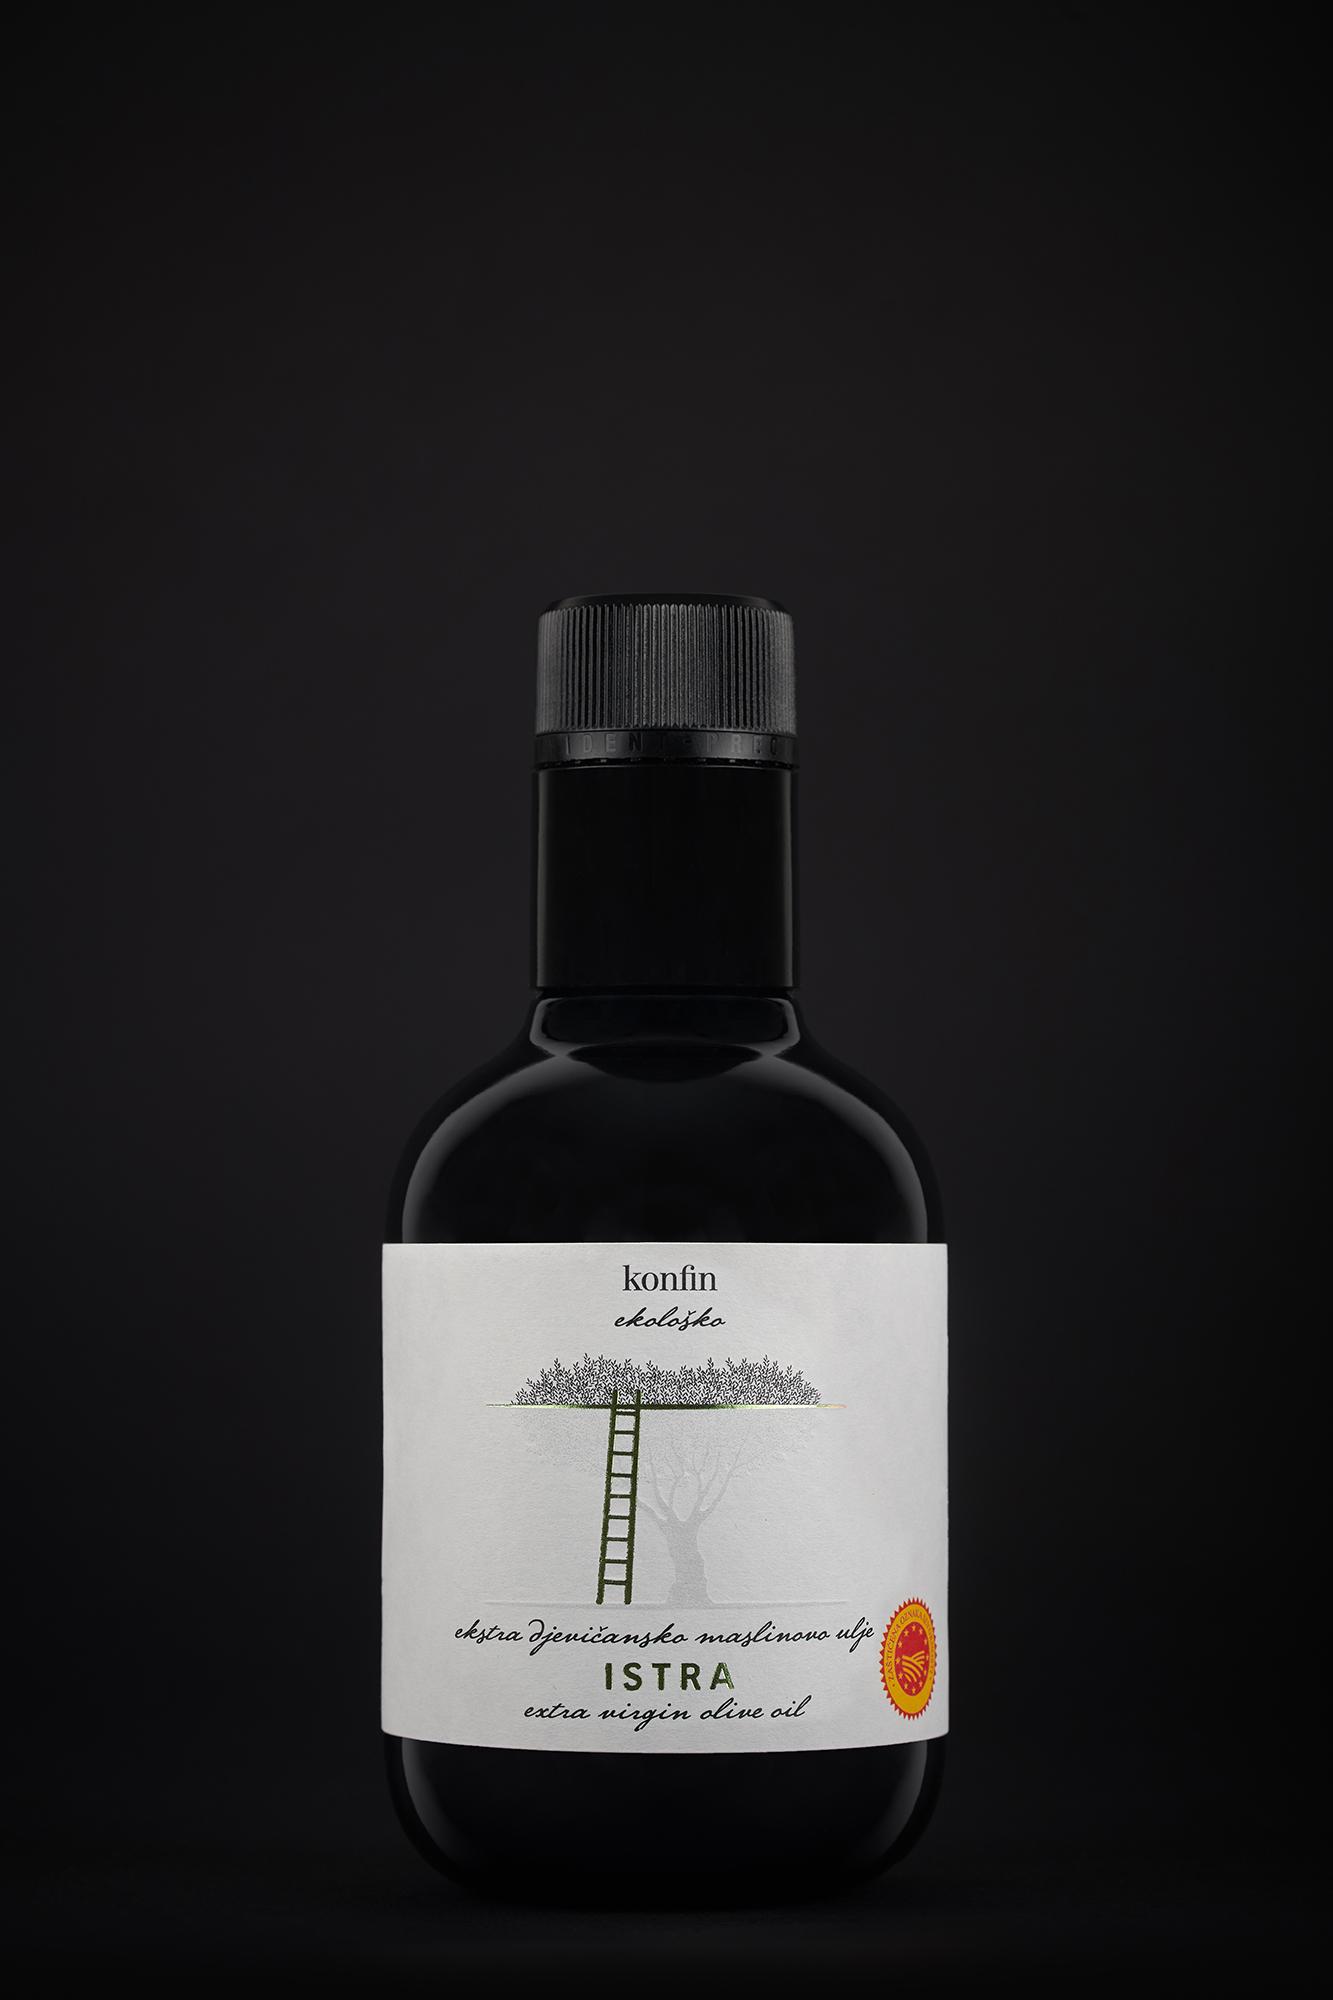 Konfin ekološko ulje 250 ml